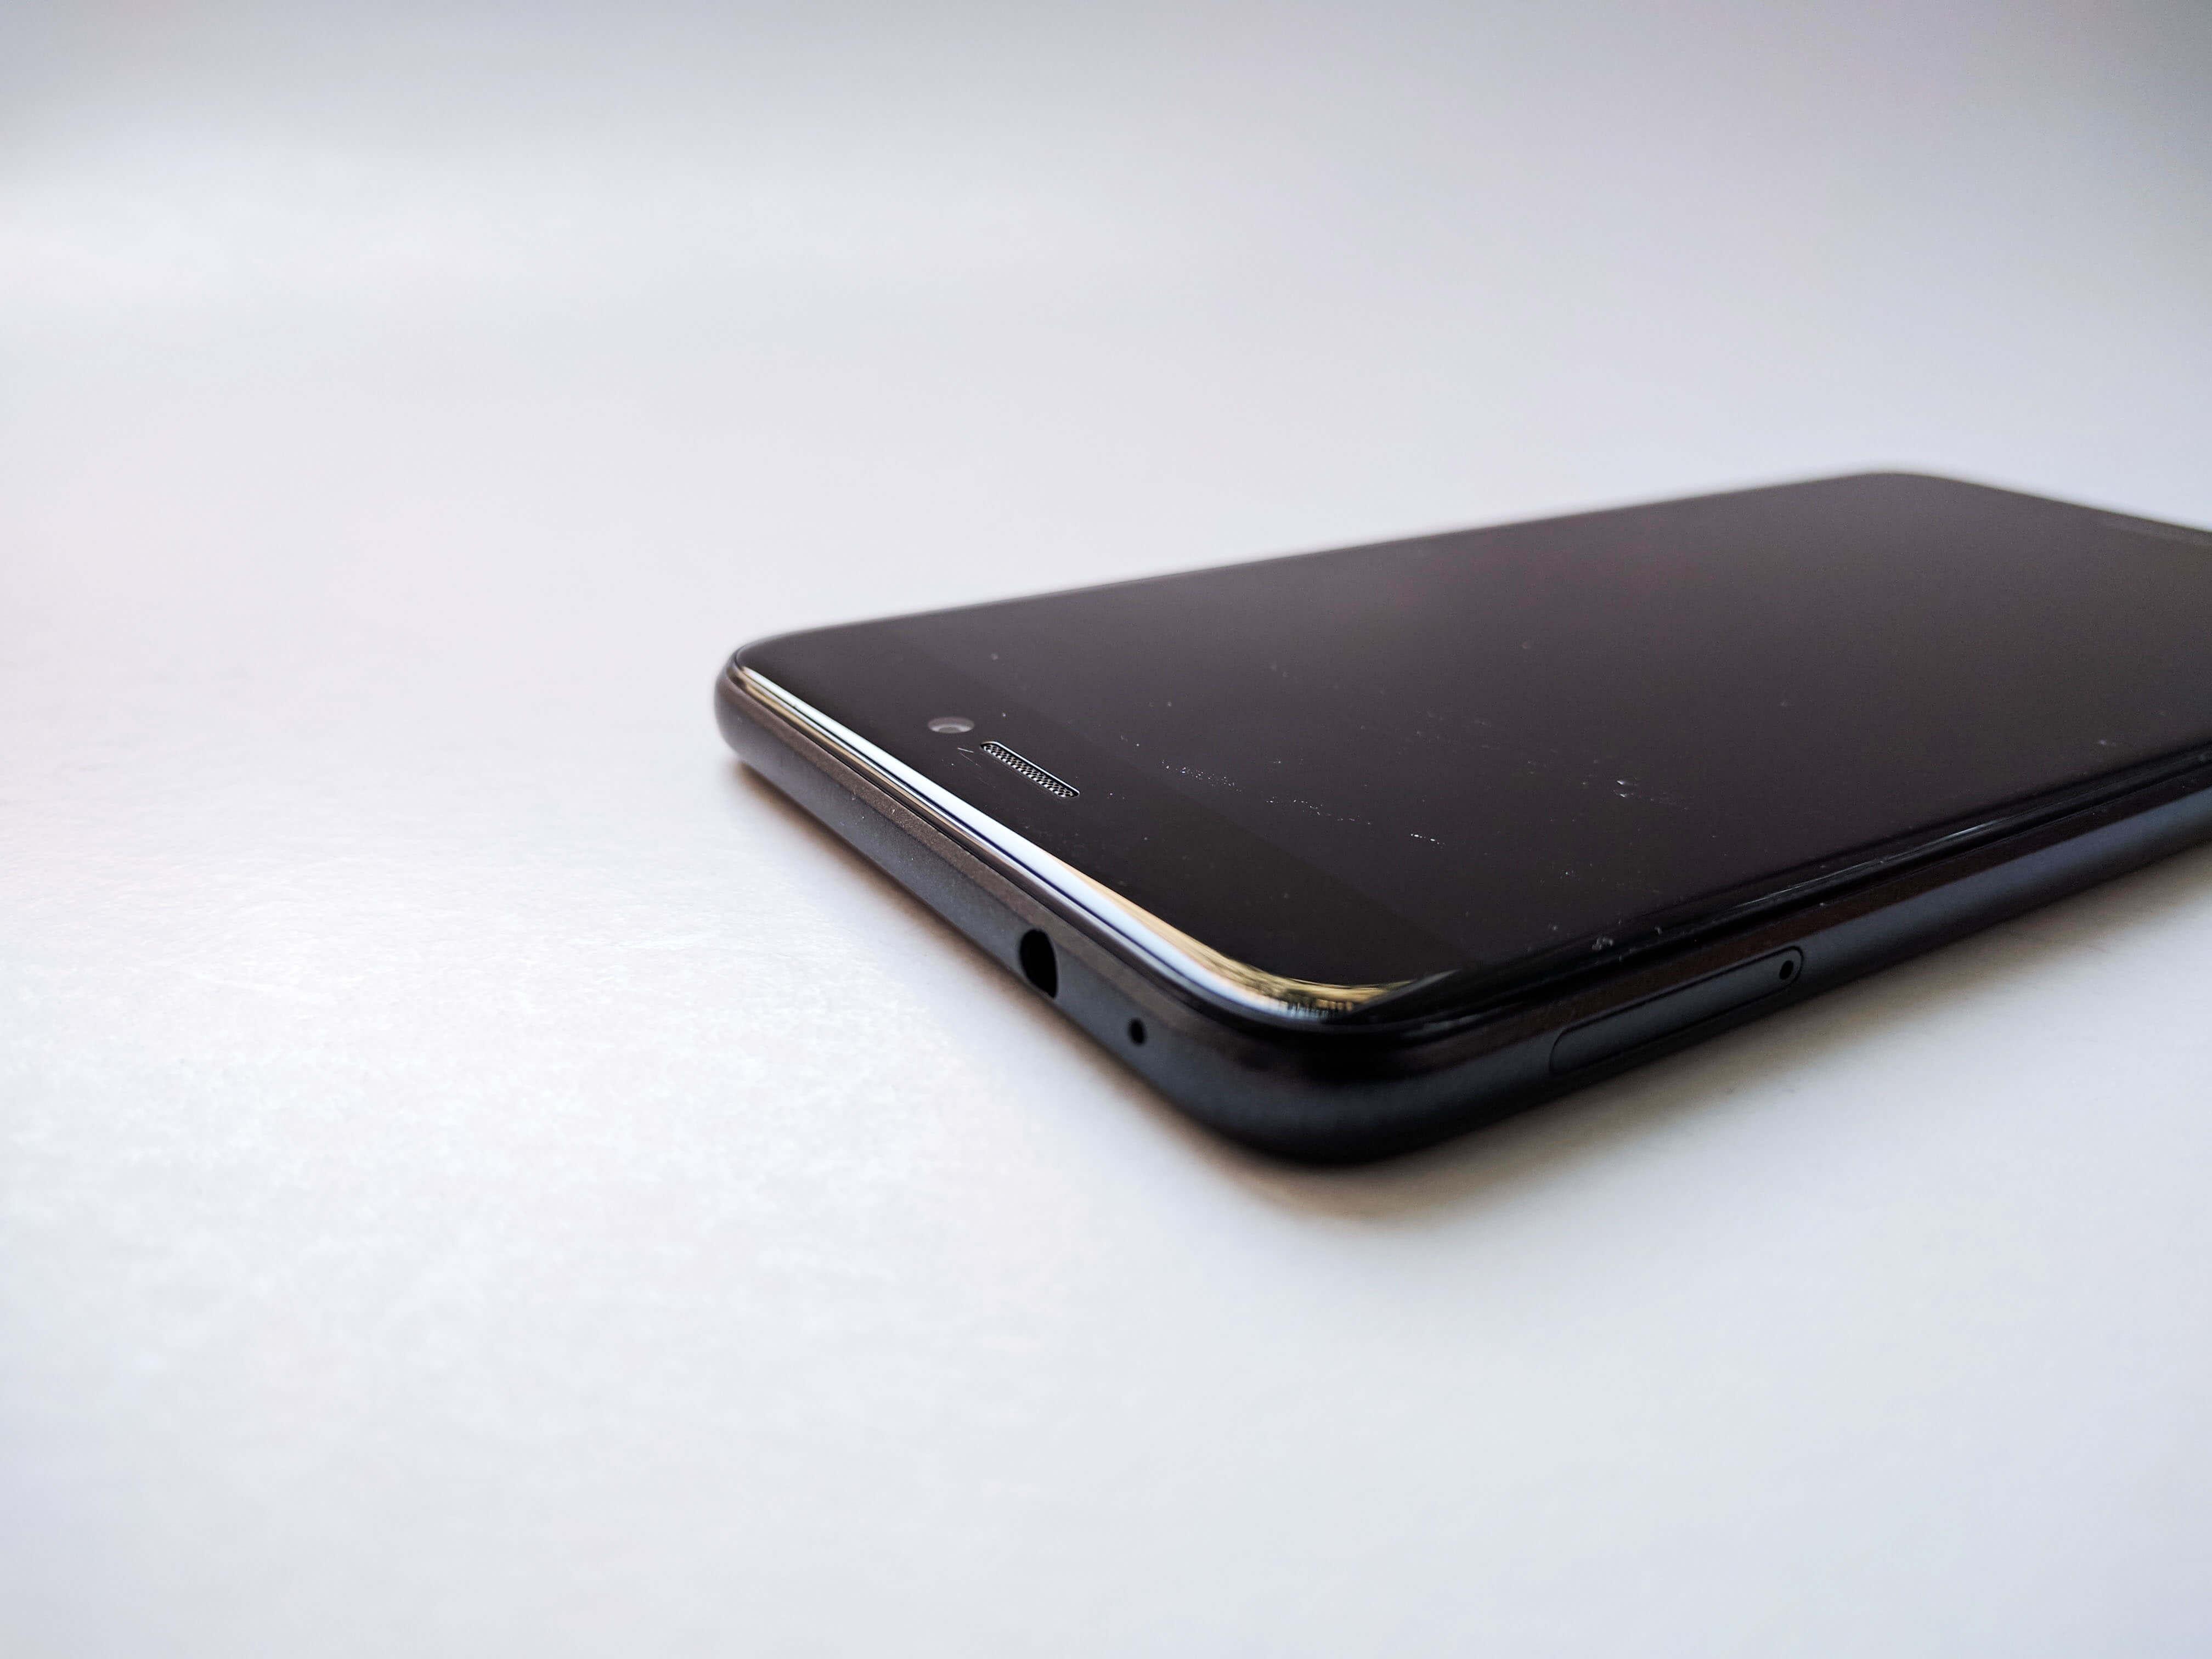 Huawei P9 Lite (2017) Review Romana, Pareri - Foto 7